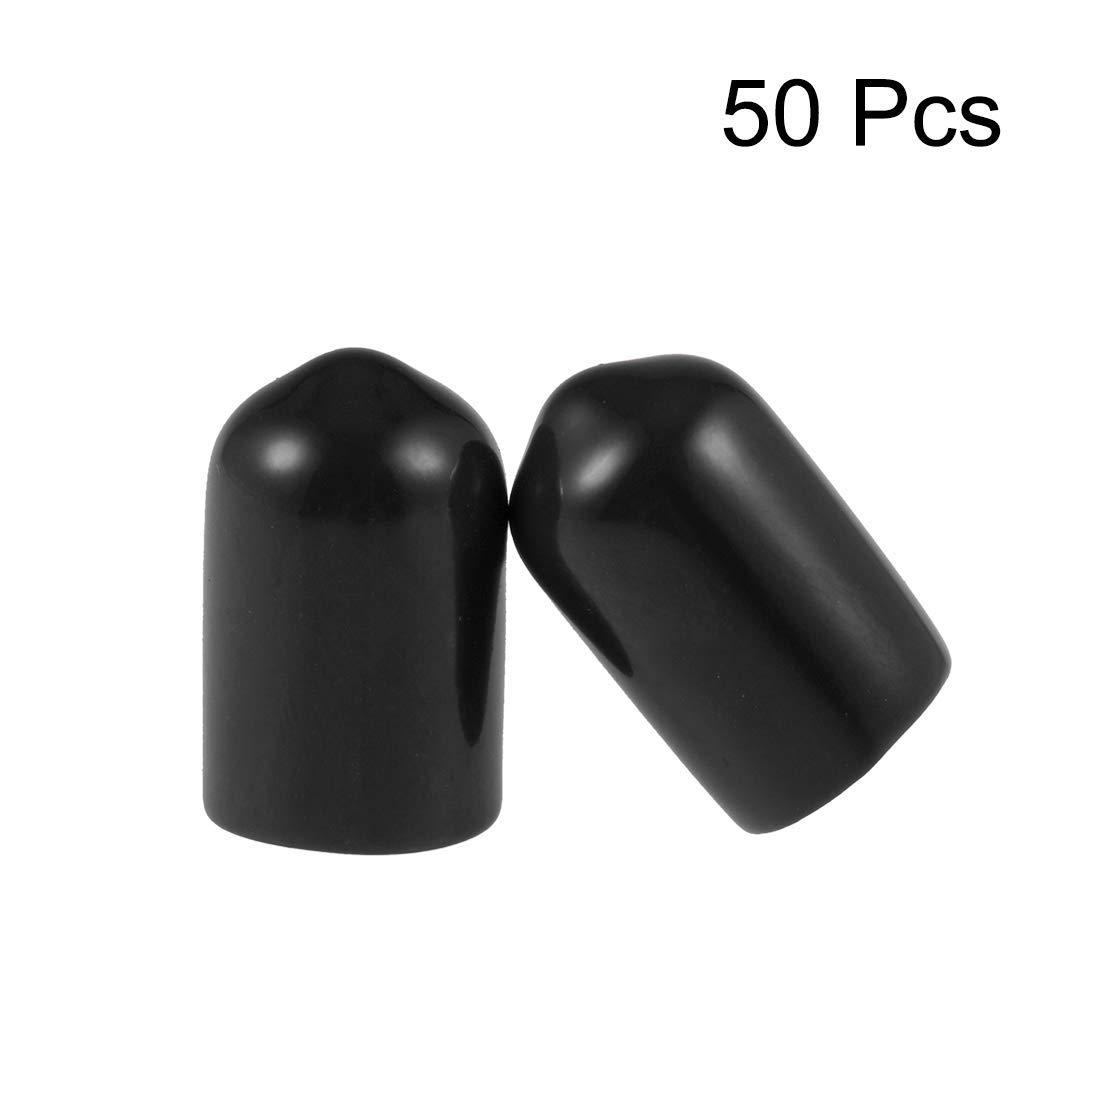 8.5mm ID Screw Thread Protectors Rubber Round end Cap Black Flexible Tube caps Tube tip 50 Pieces